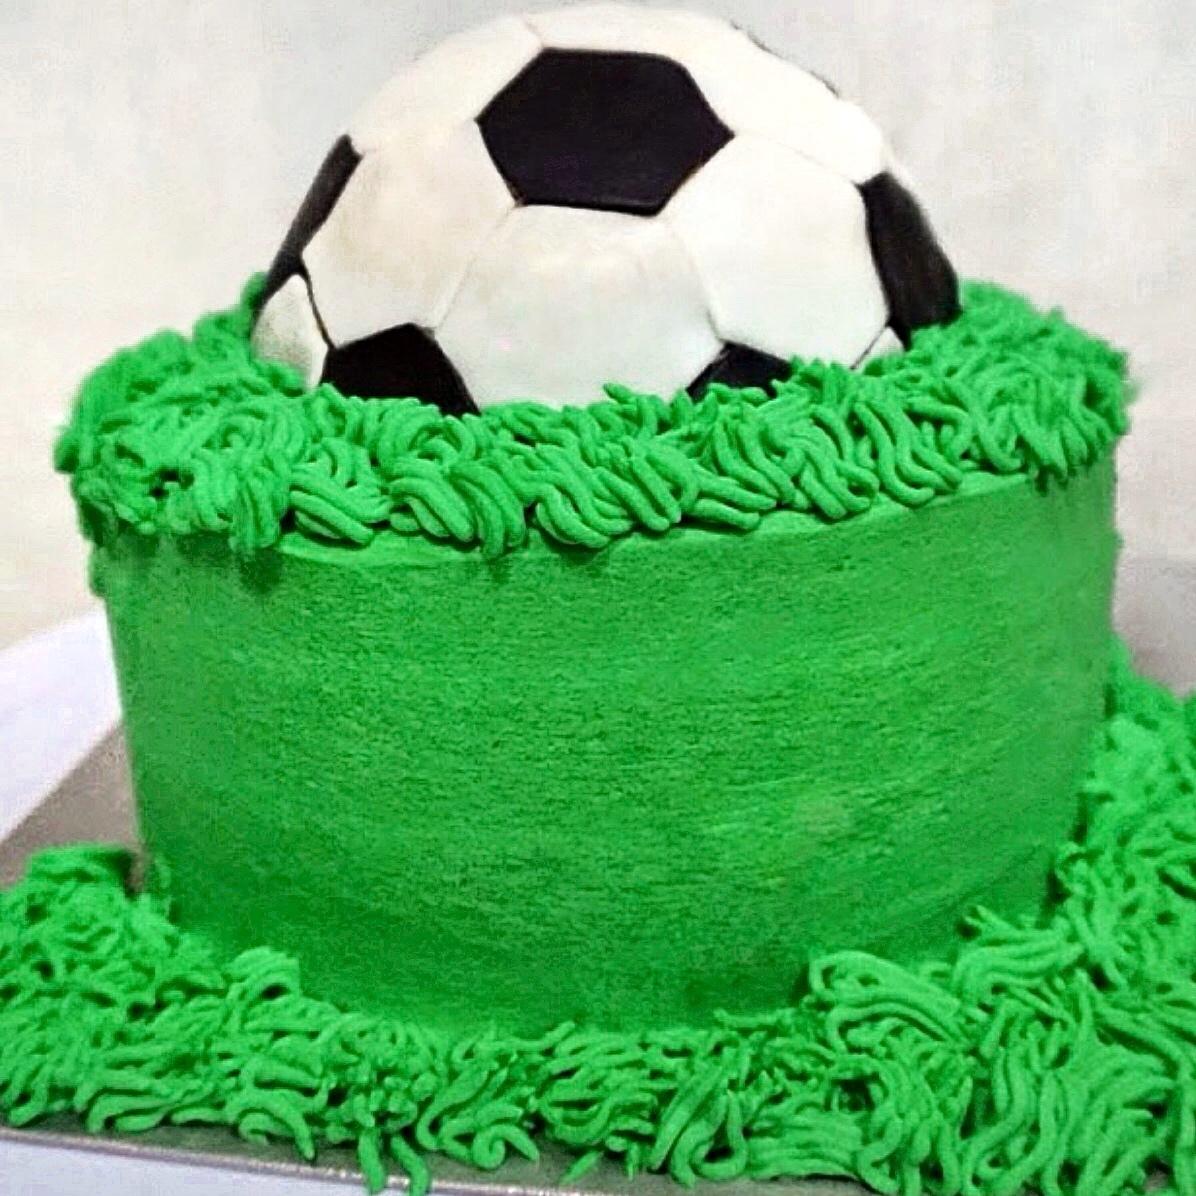 FIFA soccerball Cake